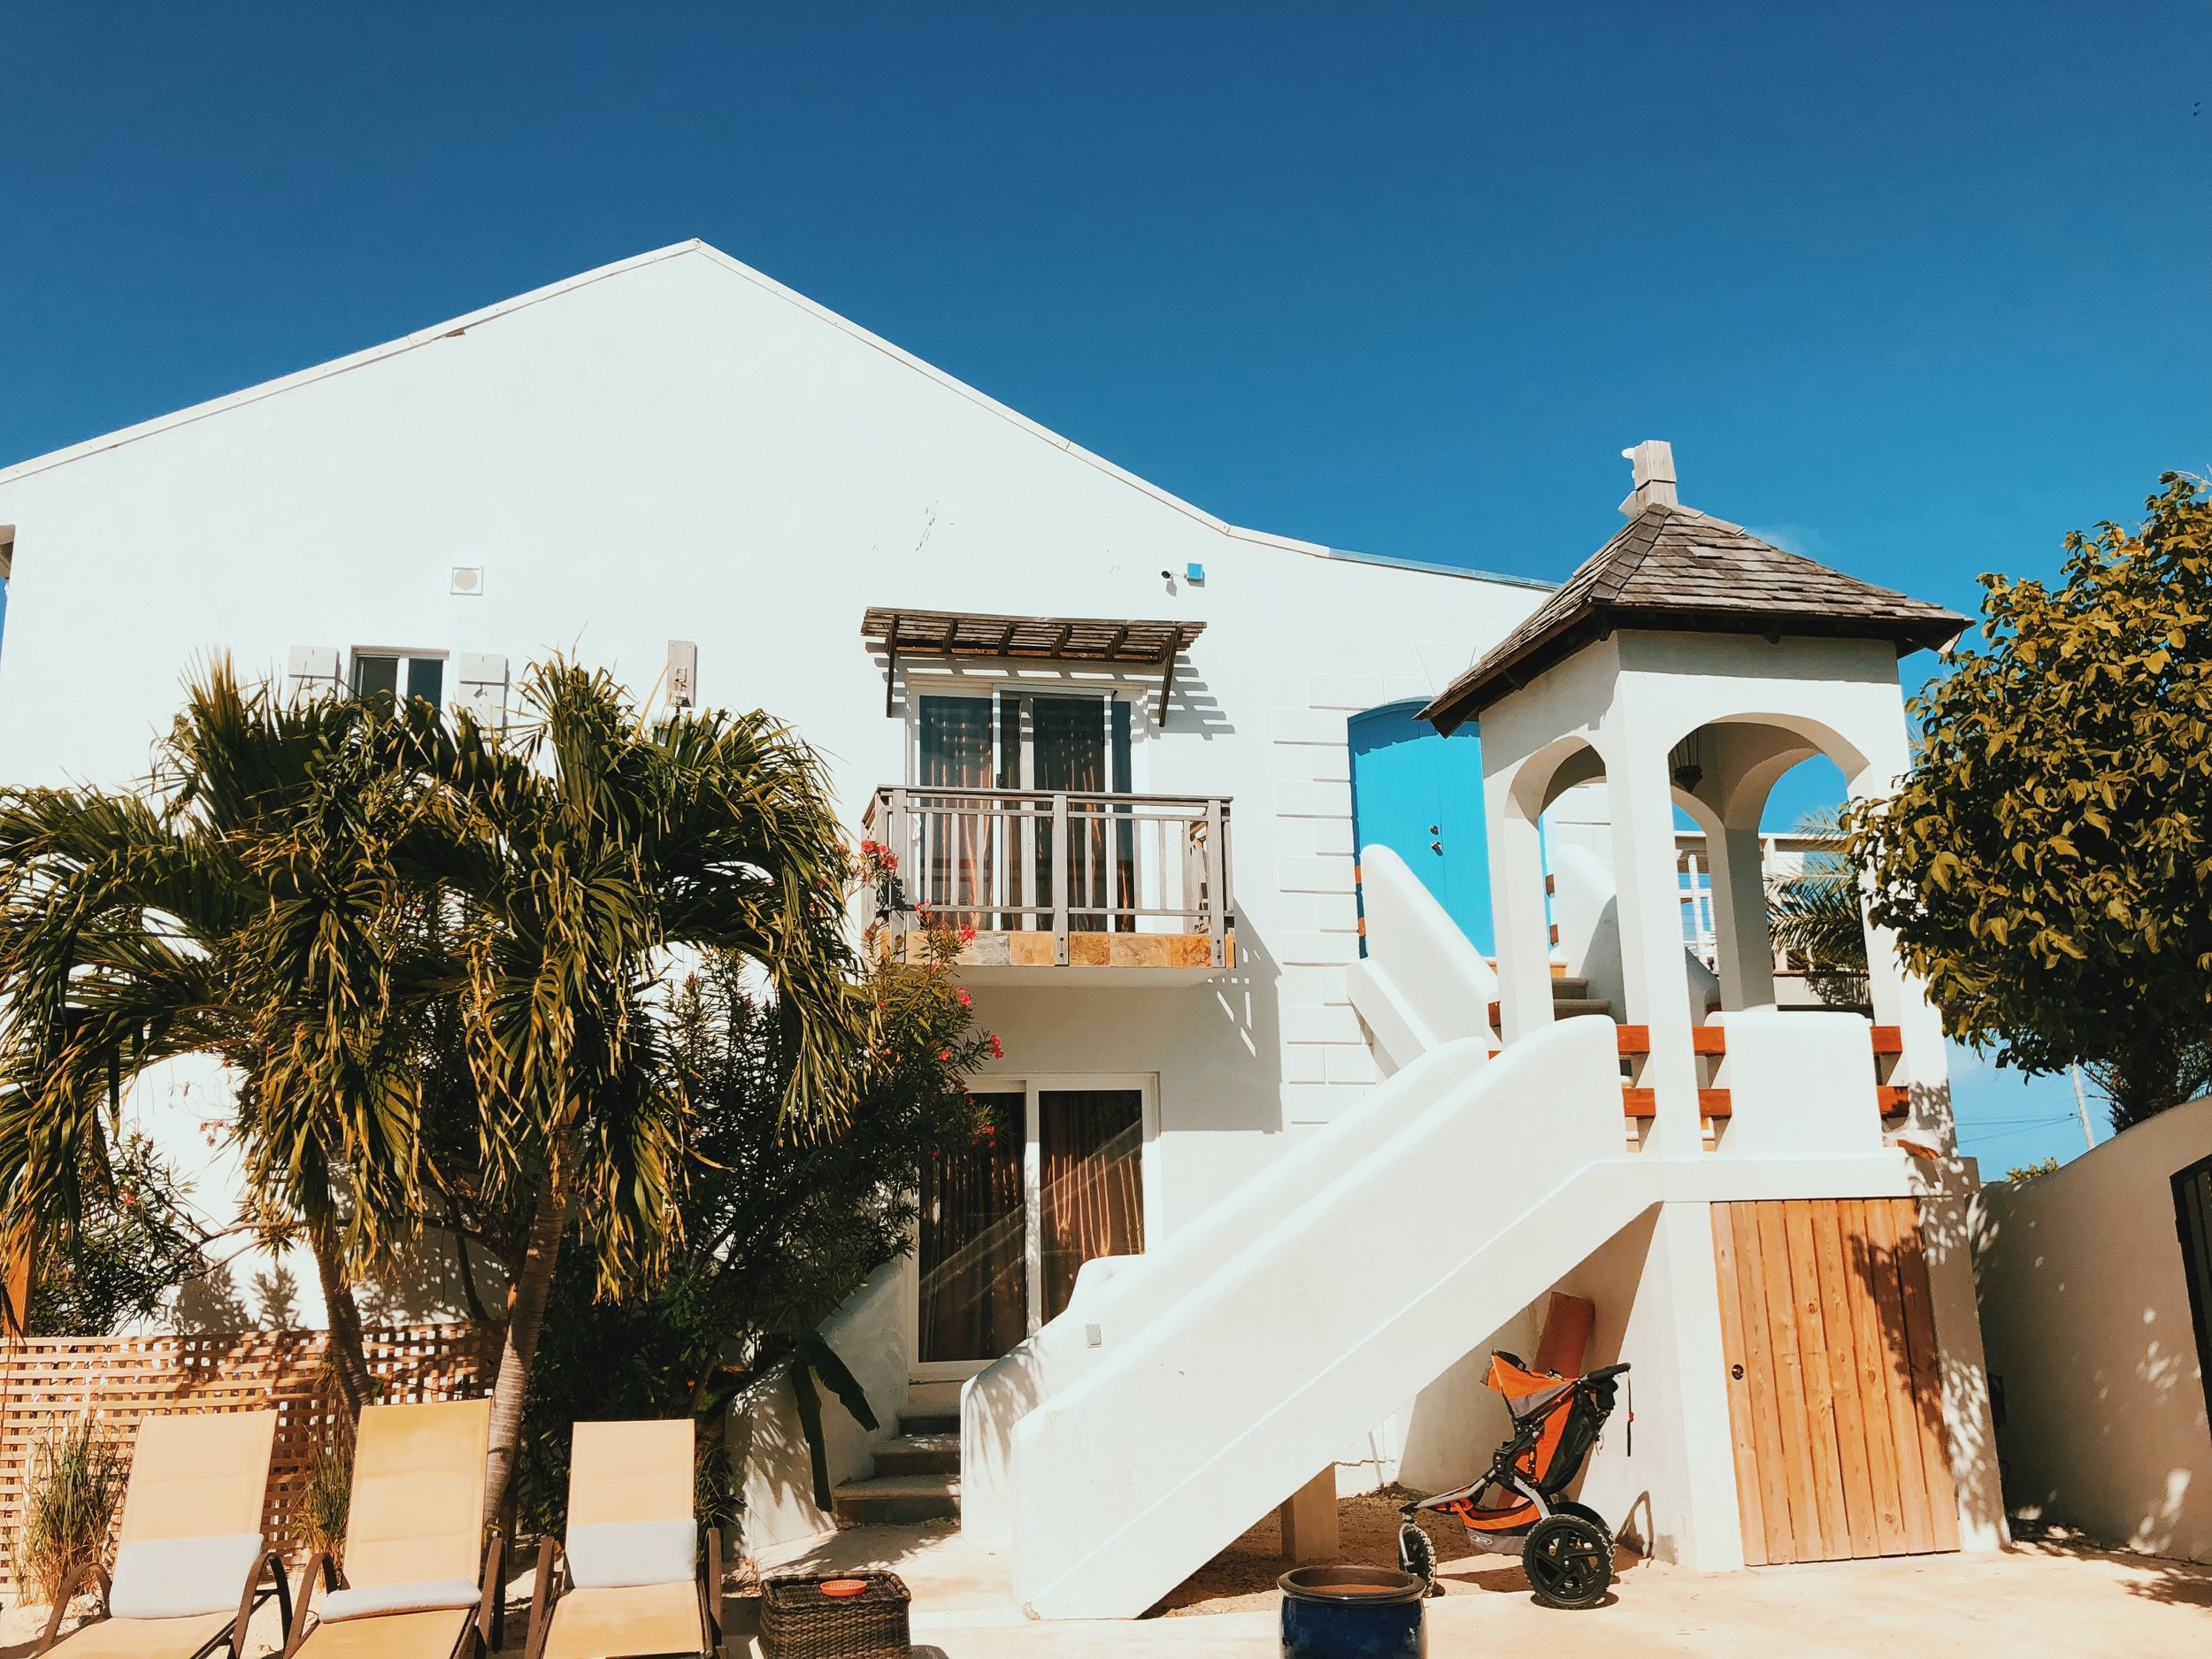 Airbnb - the sandbox villa